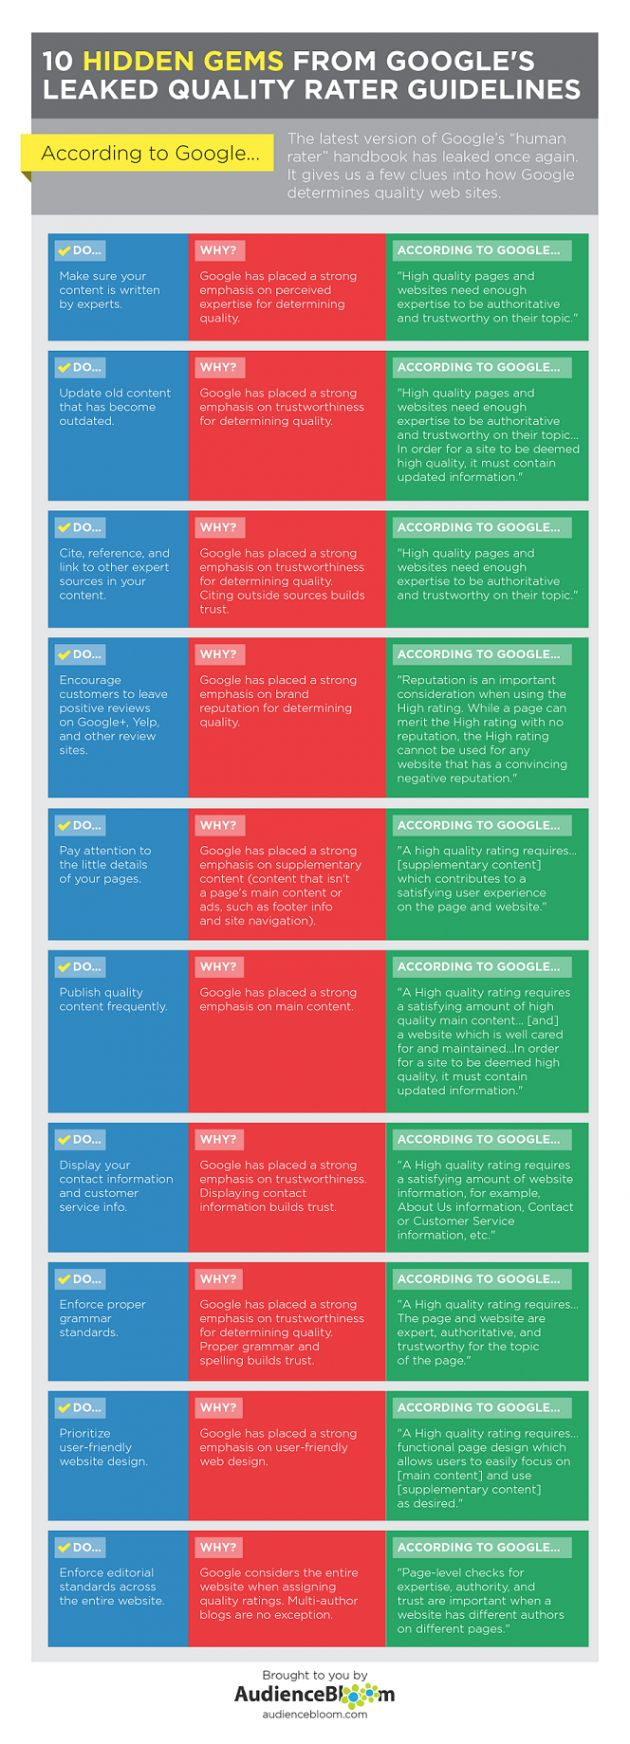 11 Simple Tactics to Increase Trust Online | Inc.com